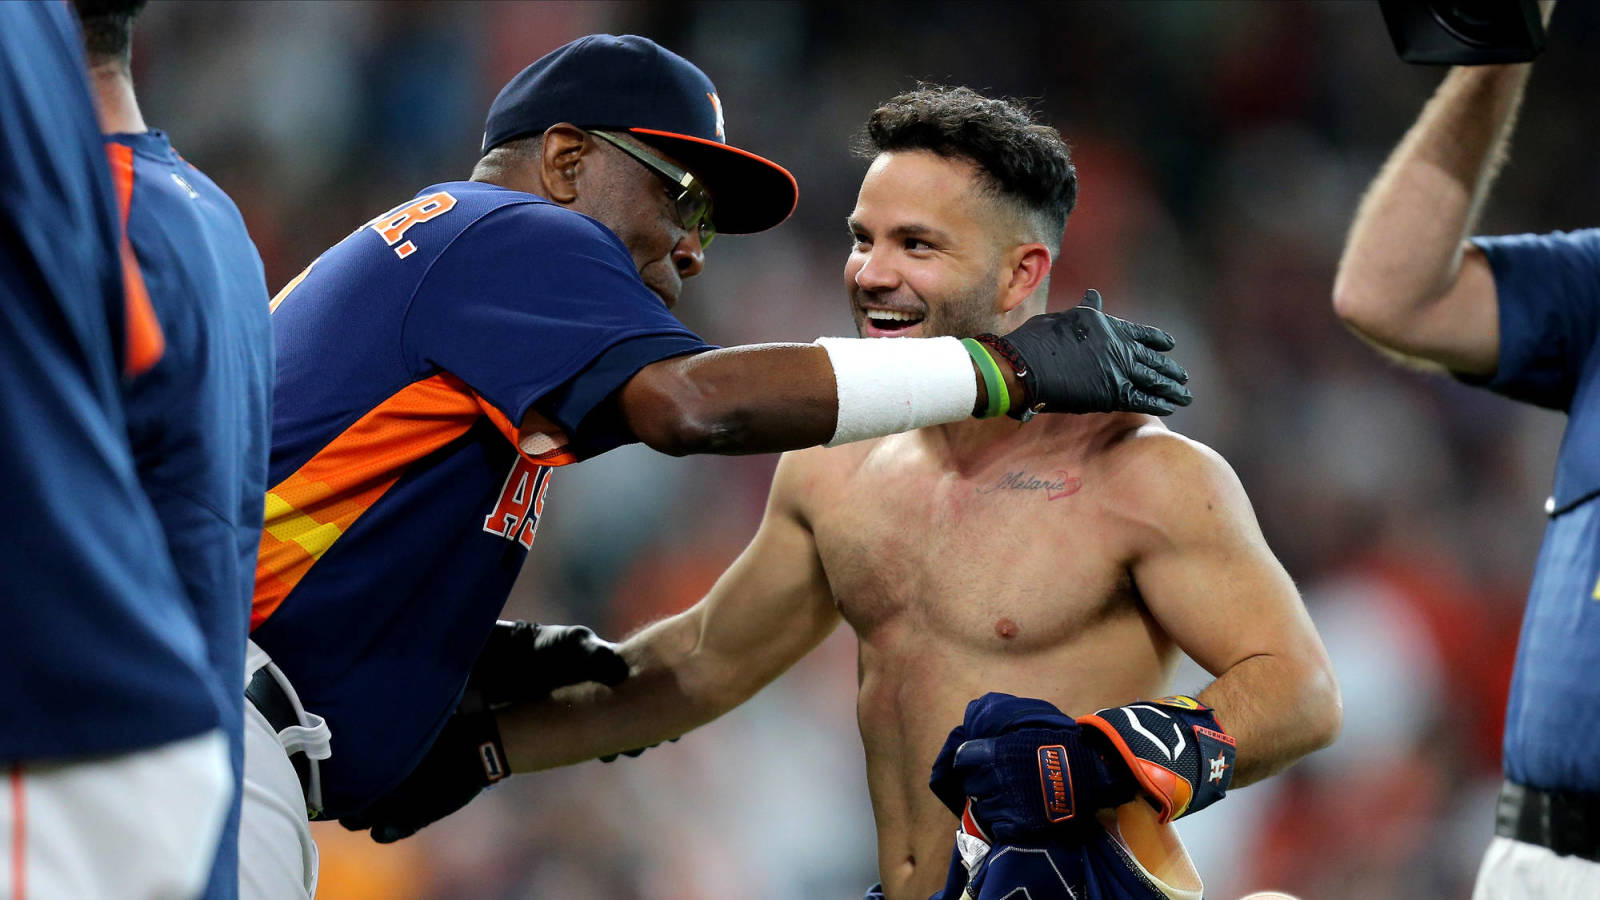 Dusty Baker congratulates Jose Altuve after Astros-Yankees walk-off.